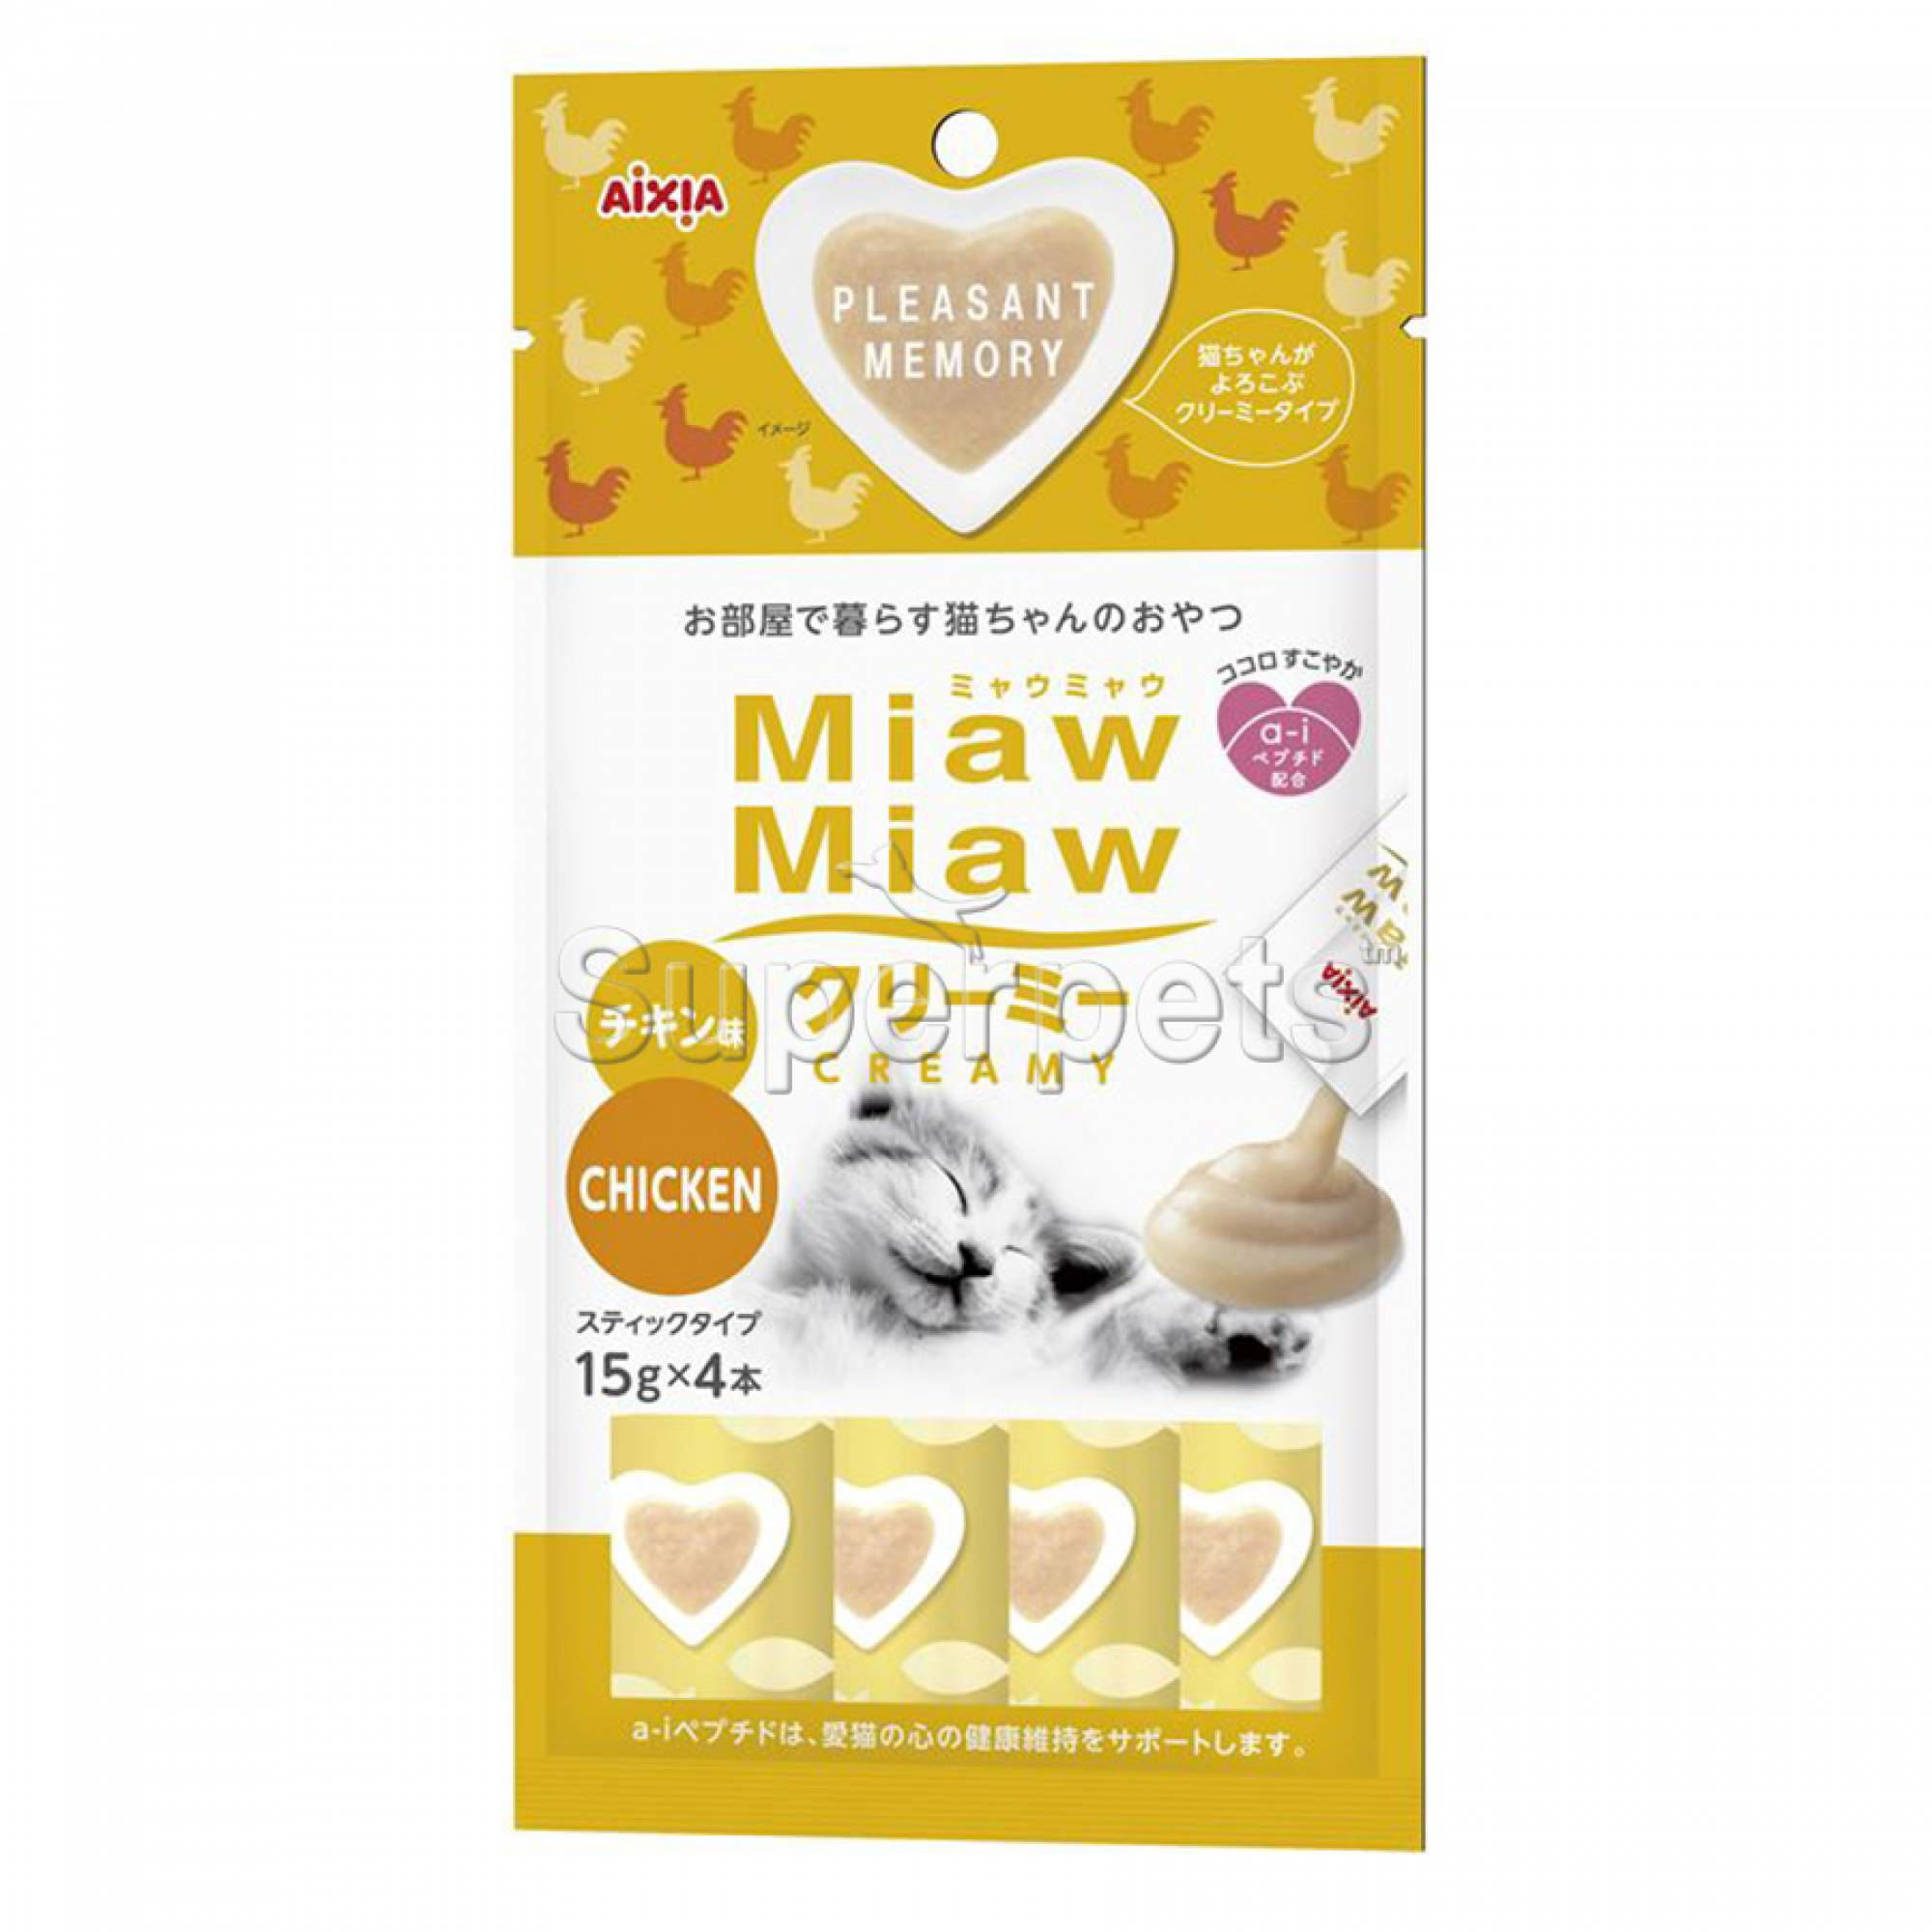 Aixia Miaw Miaw Creamy - Chicken 15g x 4pcs